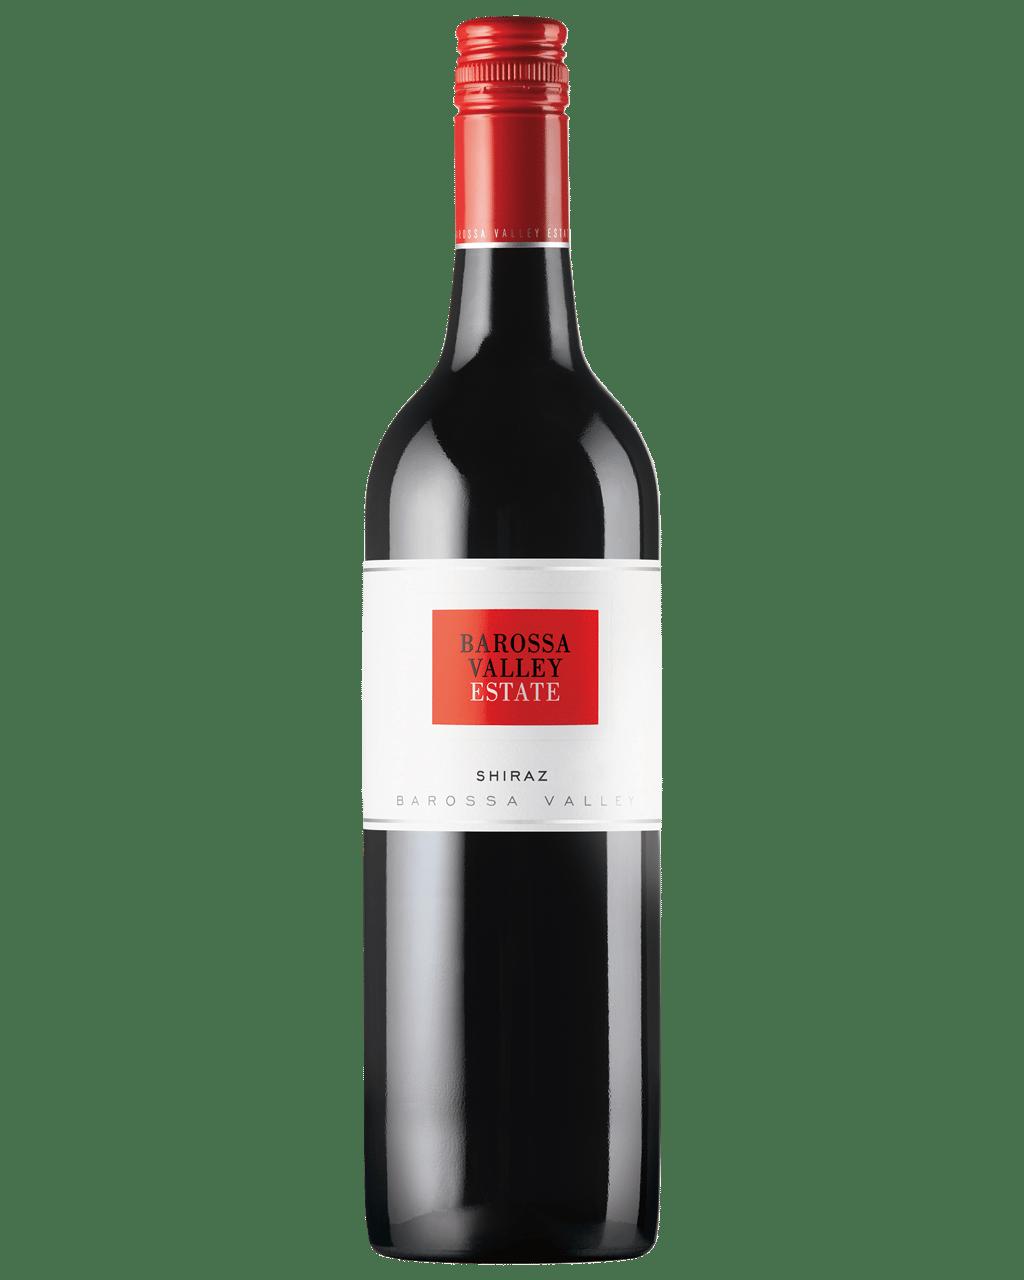 wo urlaub hemera single männer vineyard single estate machen shiraz  BAROSSA SHIRAZ ESTATE: UPDATED 2018 BB Reviews, Price Chateau Tanunda